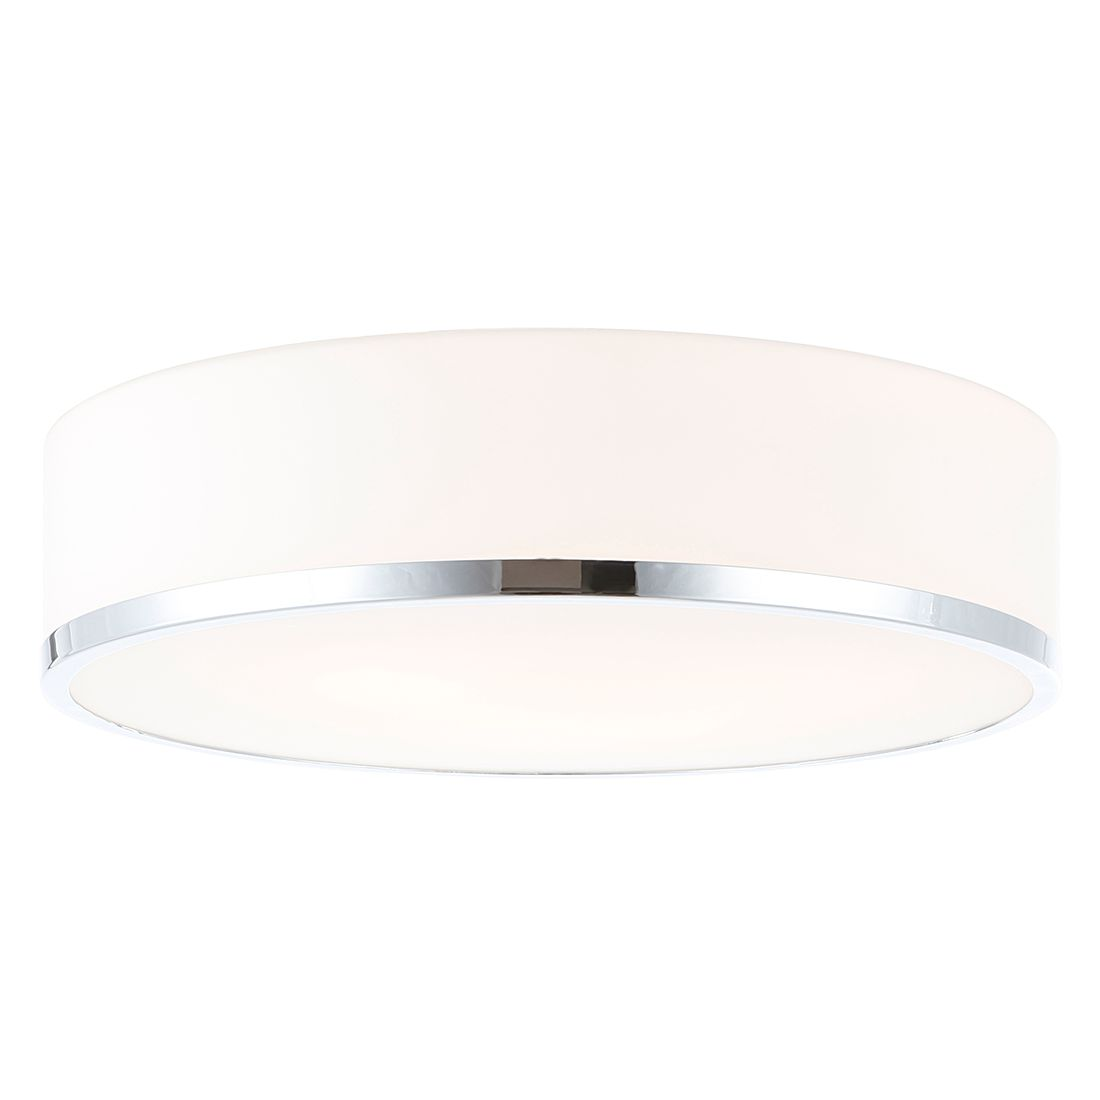 EEK A++, Deckenleuchte Plain – 3-flammig, Globo Lighting online kaufen